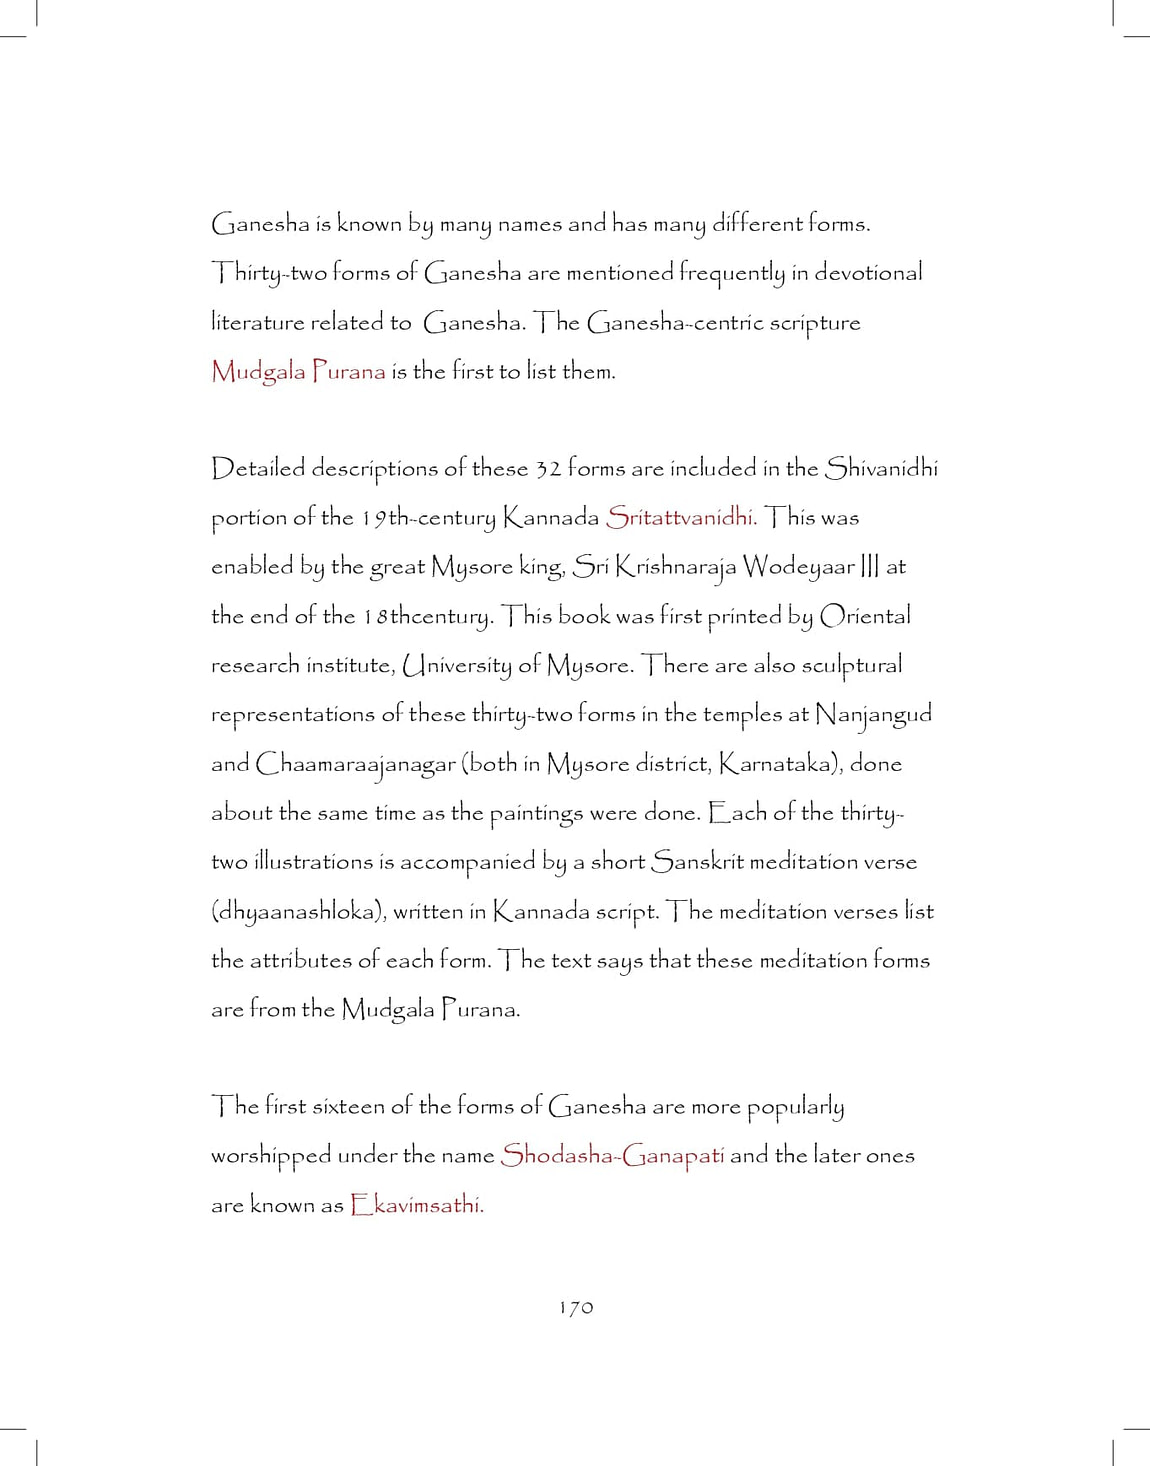 Ganesh-print_pages-to-jpg-0170.jpg